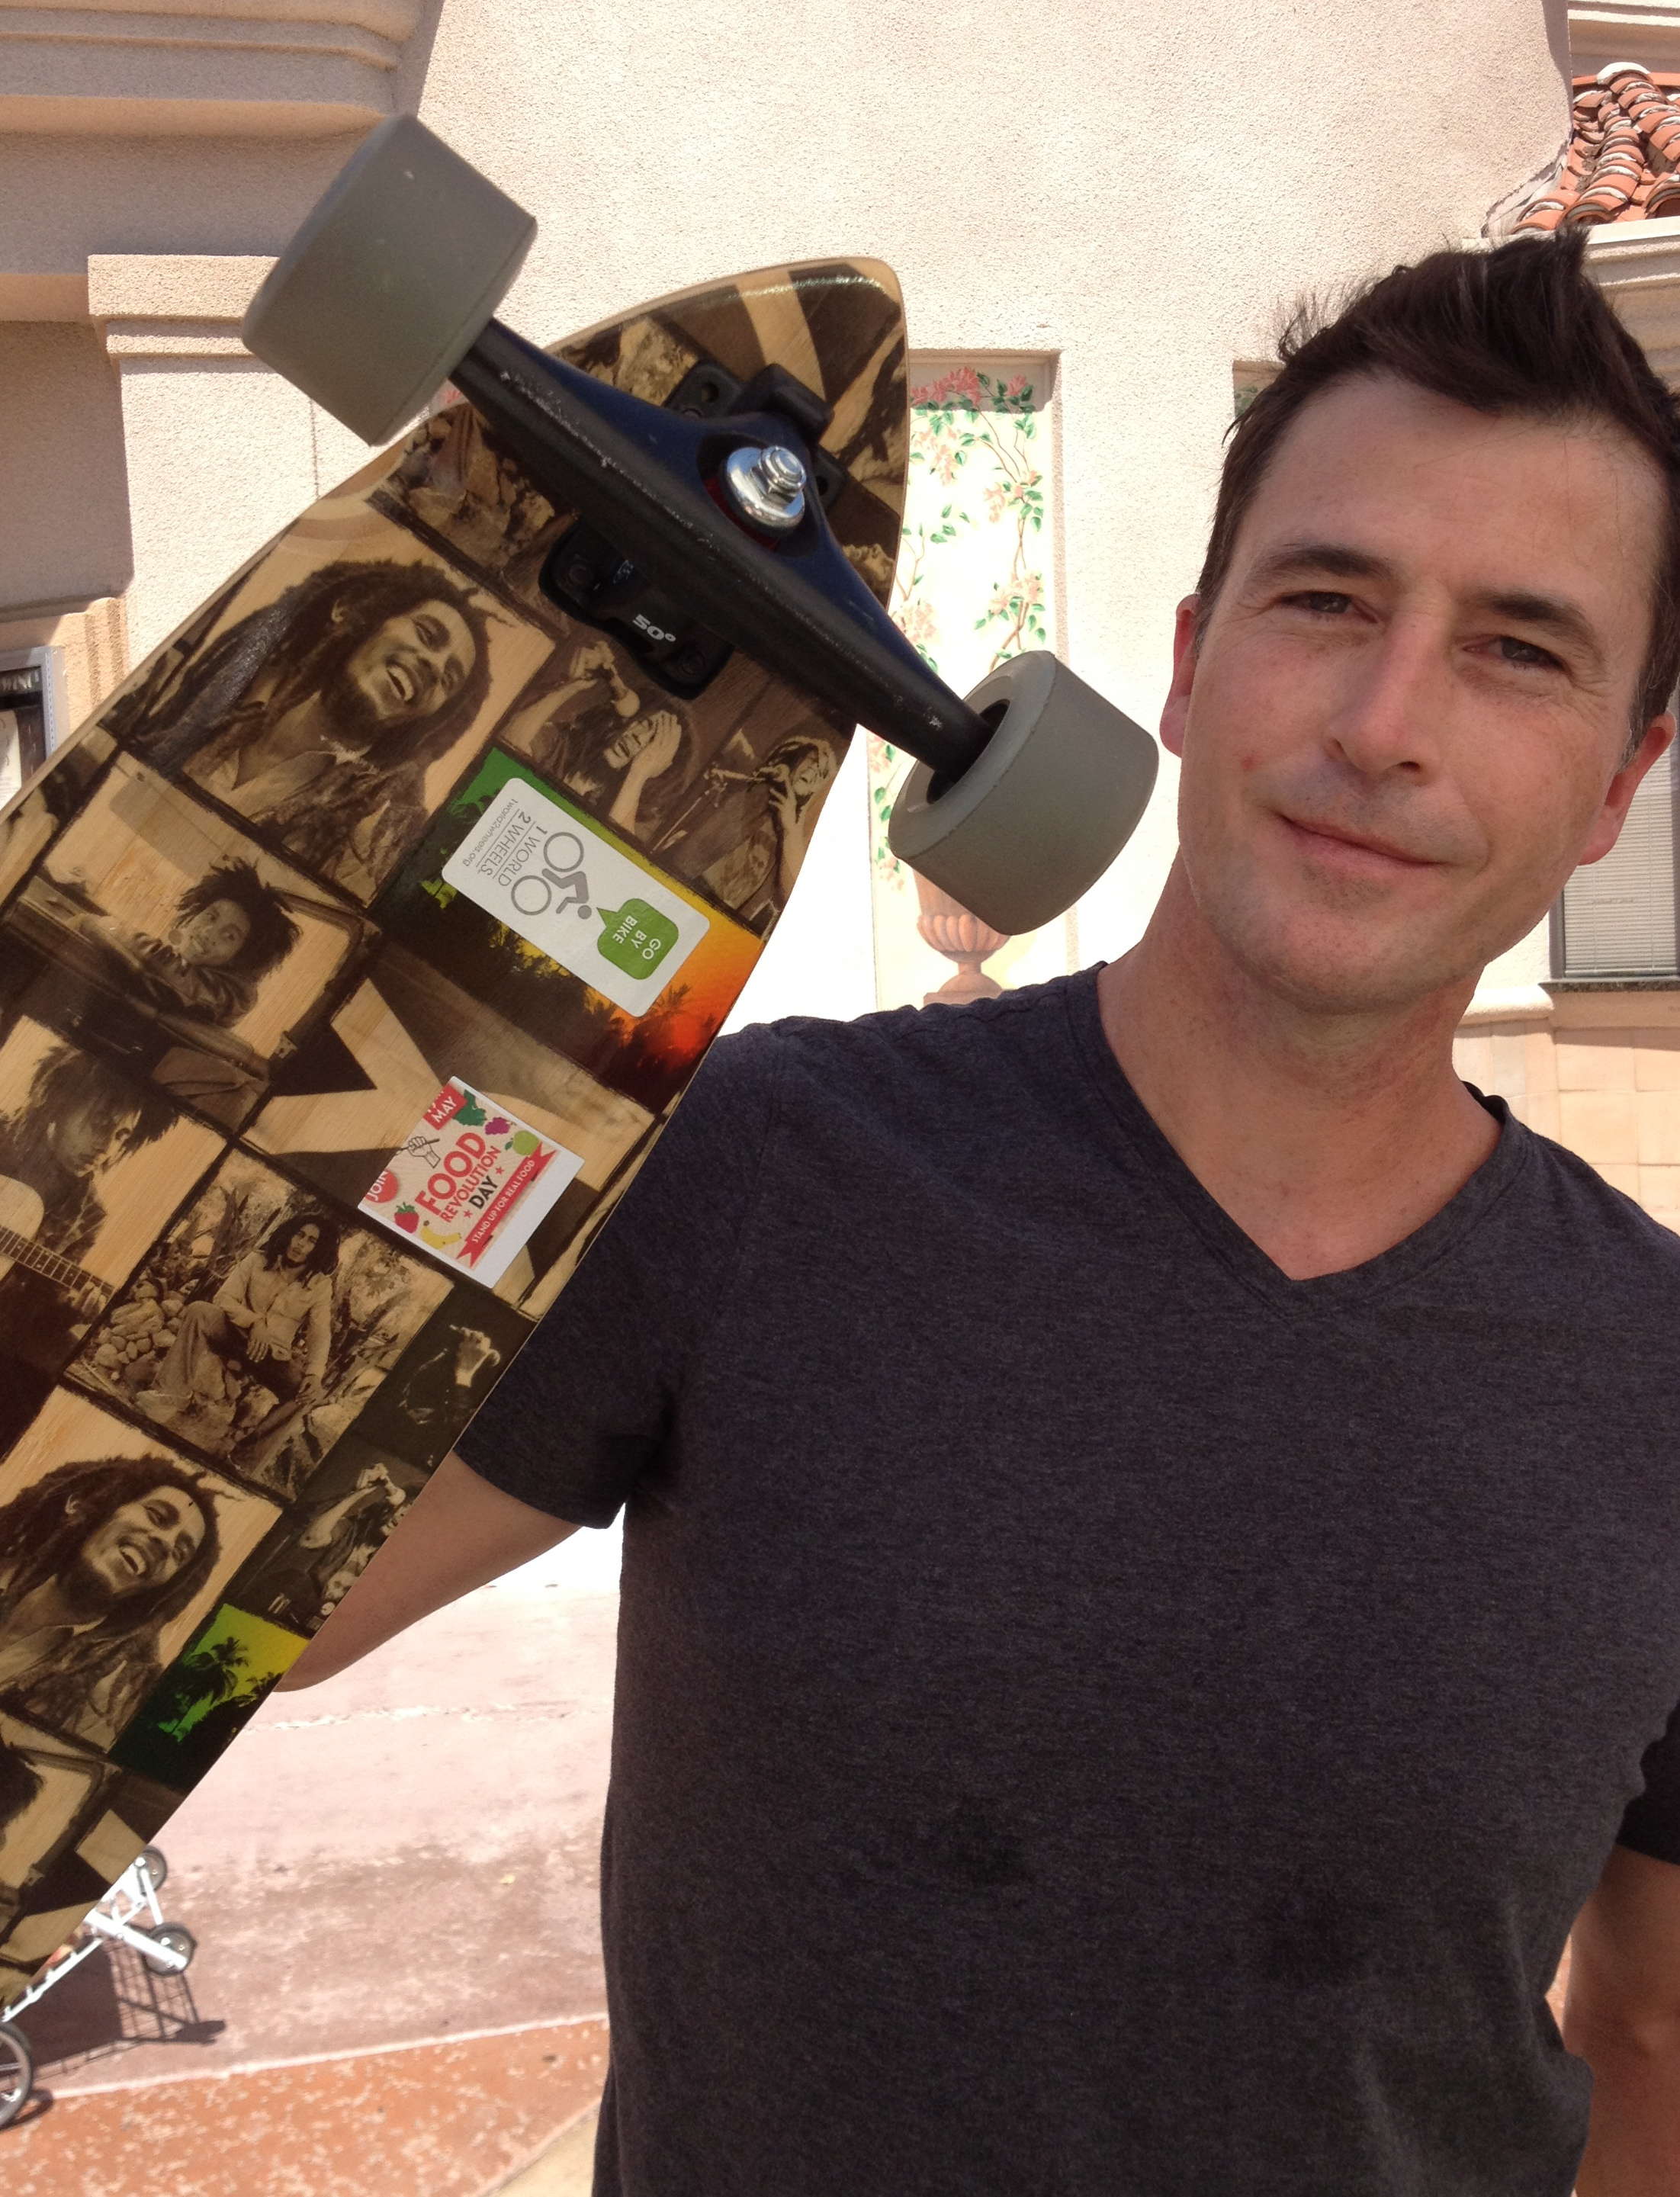 Palm Springs Food Revolution skateboarder